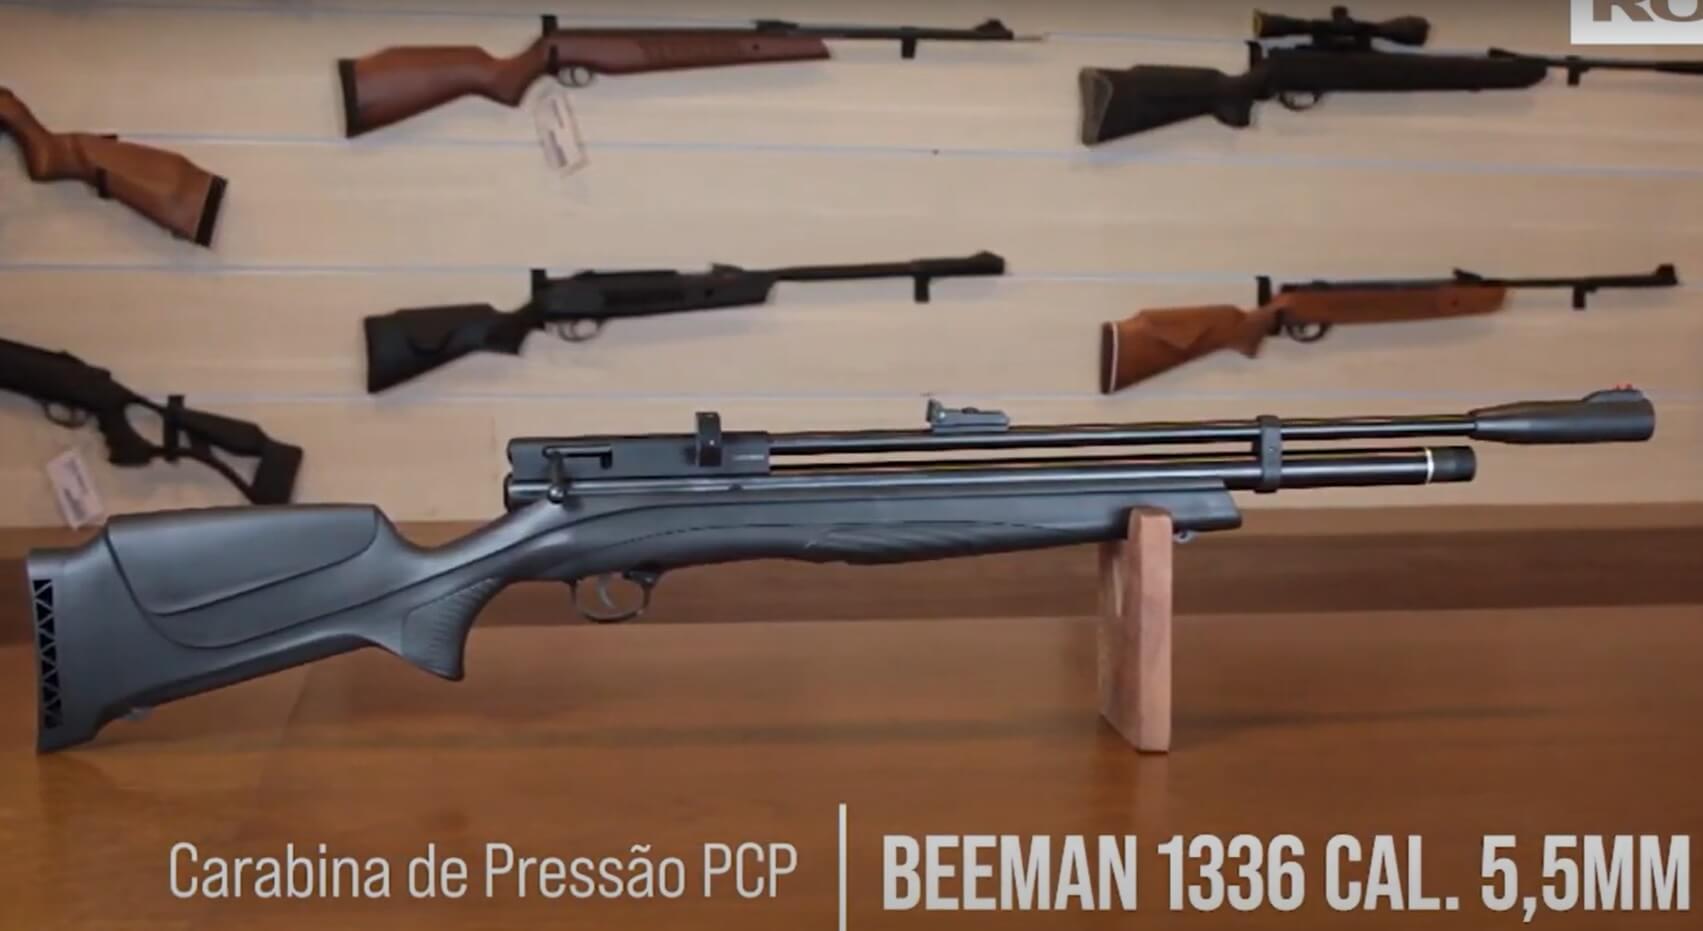 Carabina PCP Beeman POLIMERO 1336 QB II PLUS 5,5mm + Luneta 4x32